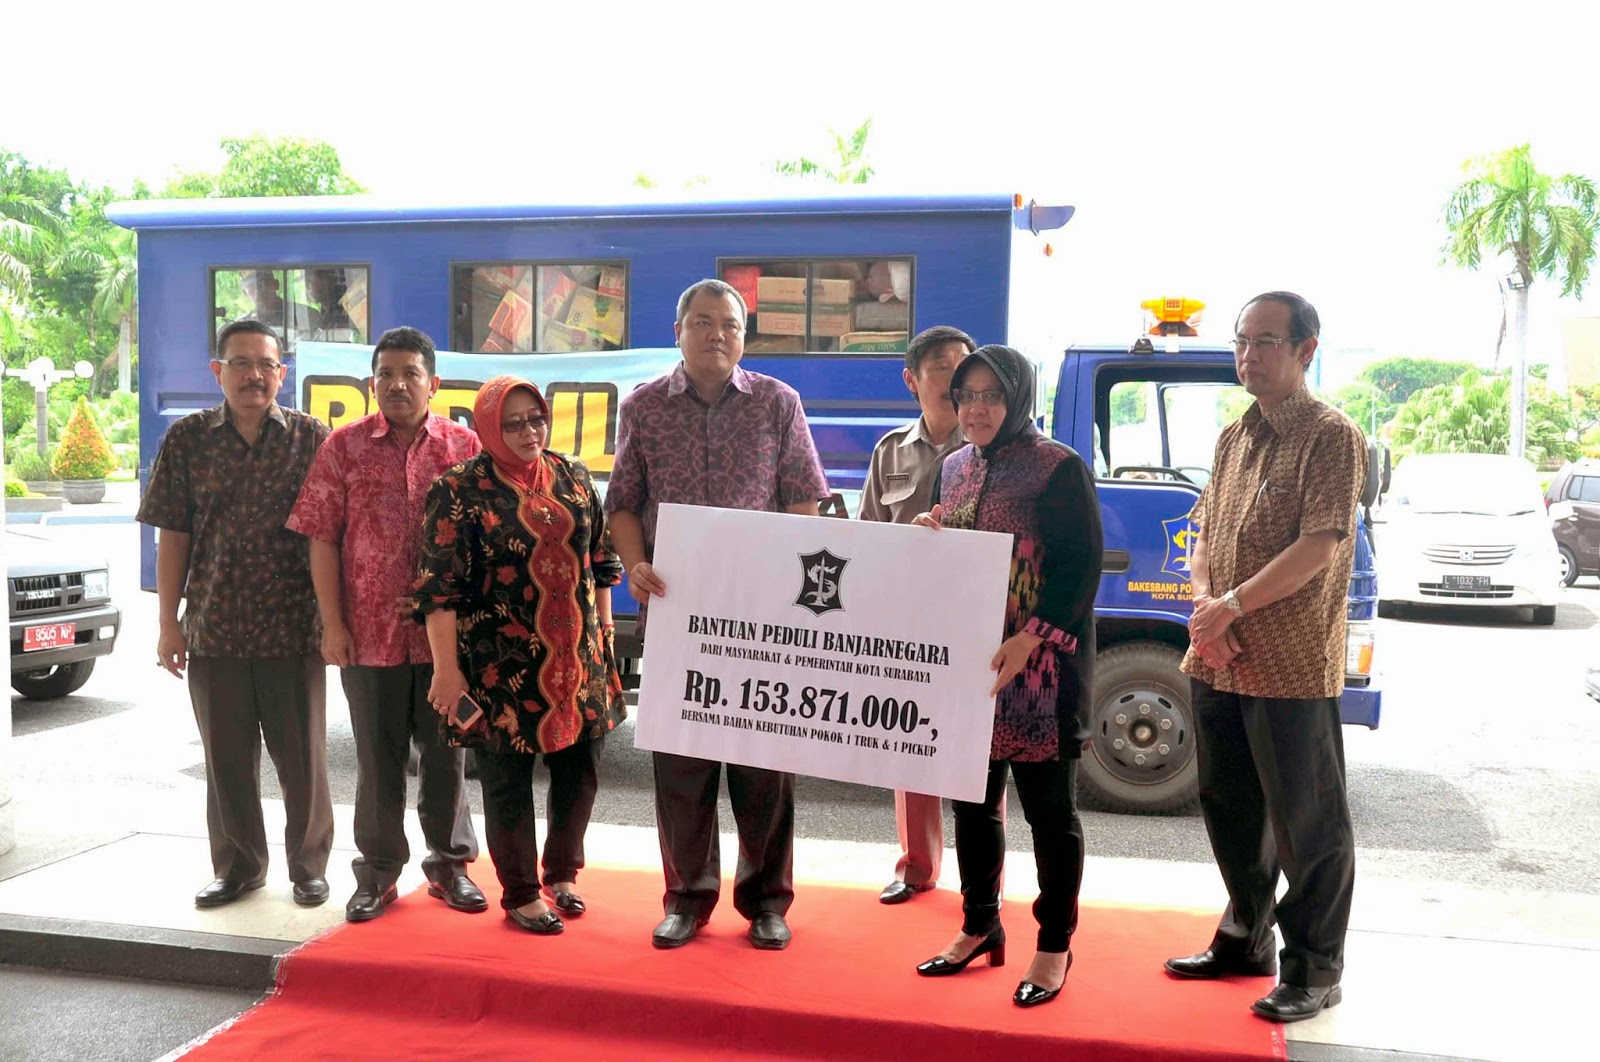 Majalah Fakta Online 2015 01 11 Produk Ukm Bumn Abon Sapi Ukuran 1 Kg Bantuan Walikota Surabaya Berangkatkan Untuk Musibah Tanah Longsor Banjarnegara